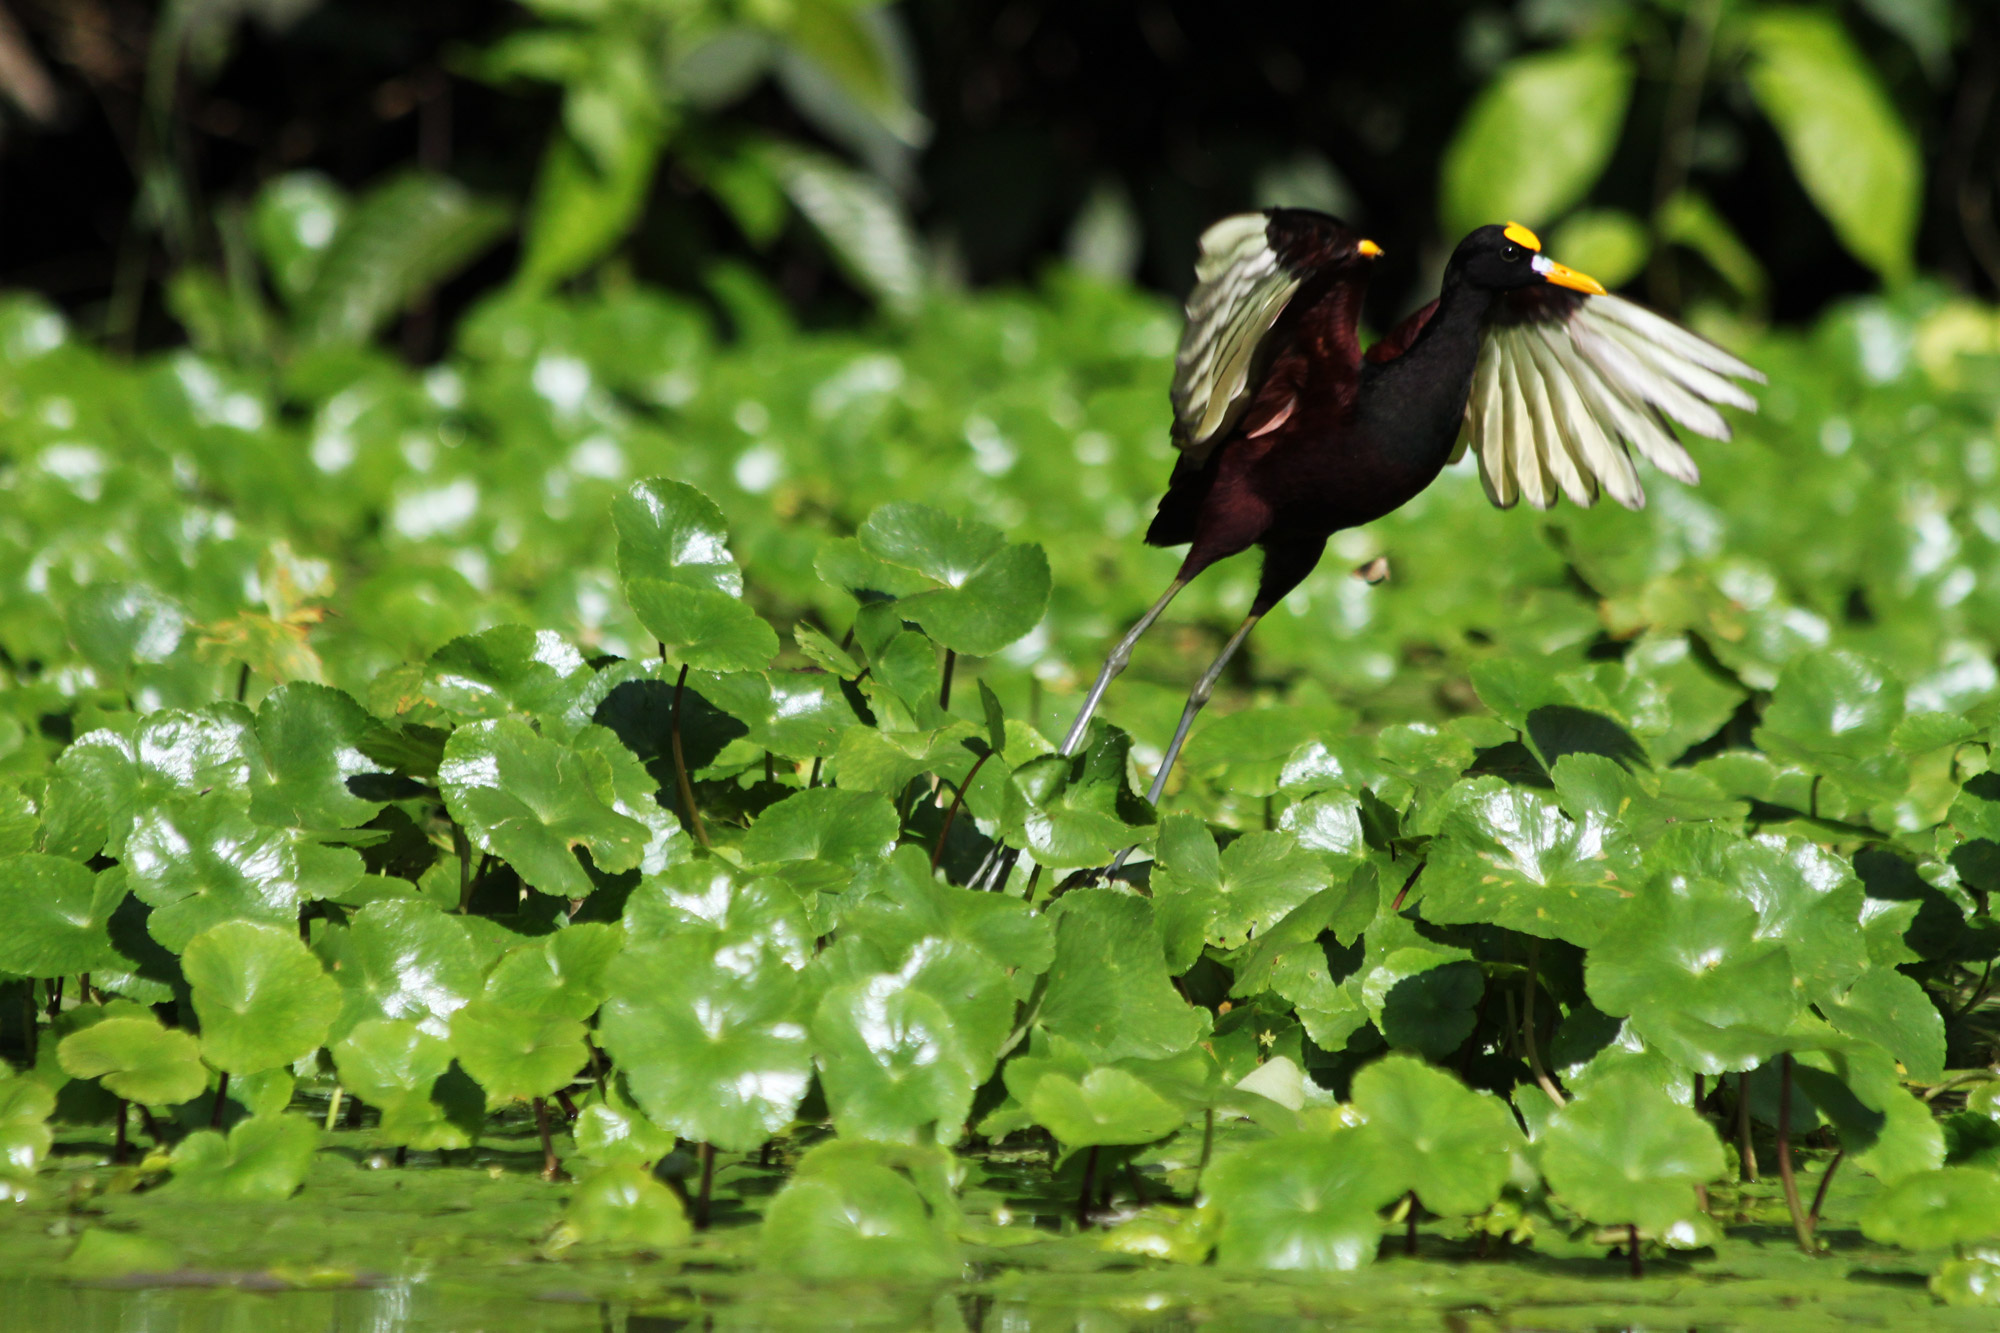 Costa Rica 2014 - dag 5 - Parque Nacional Tortuguero per boot